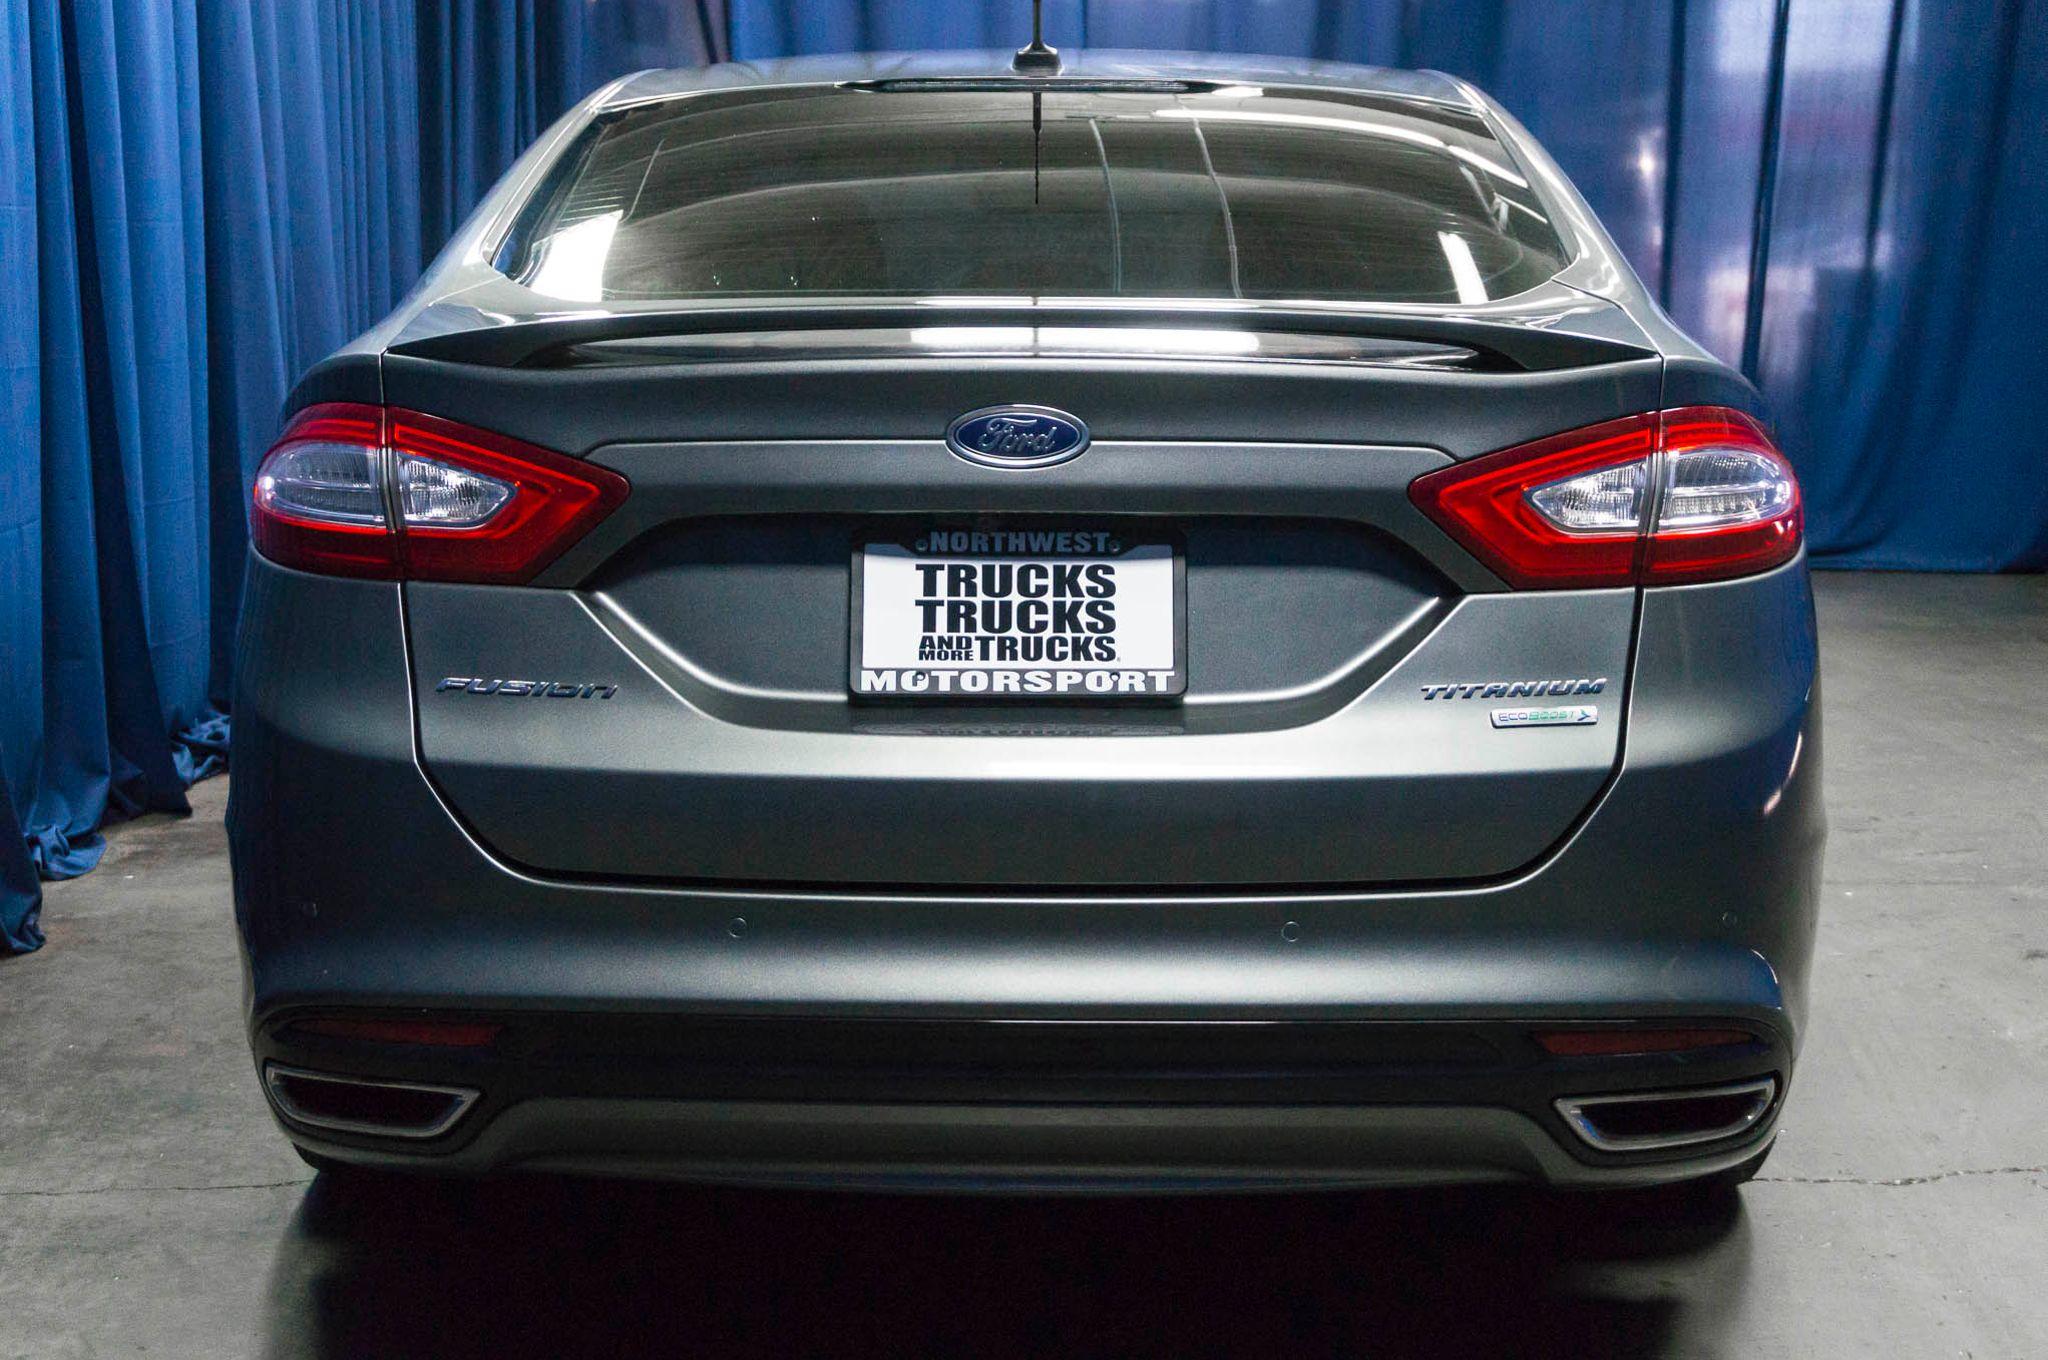 Used 2013 Ford Fusion Titanium Ecoboost FWD Sedan For Sale A